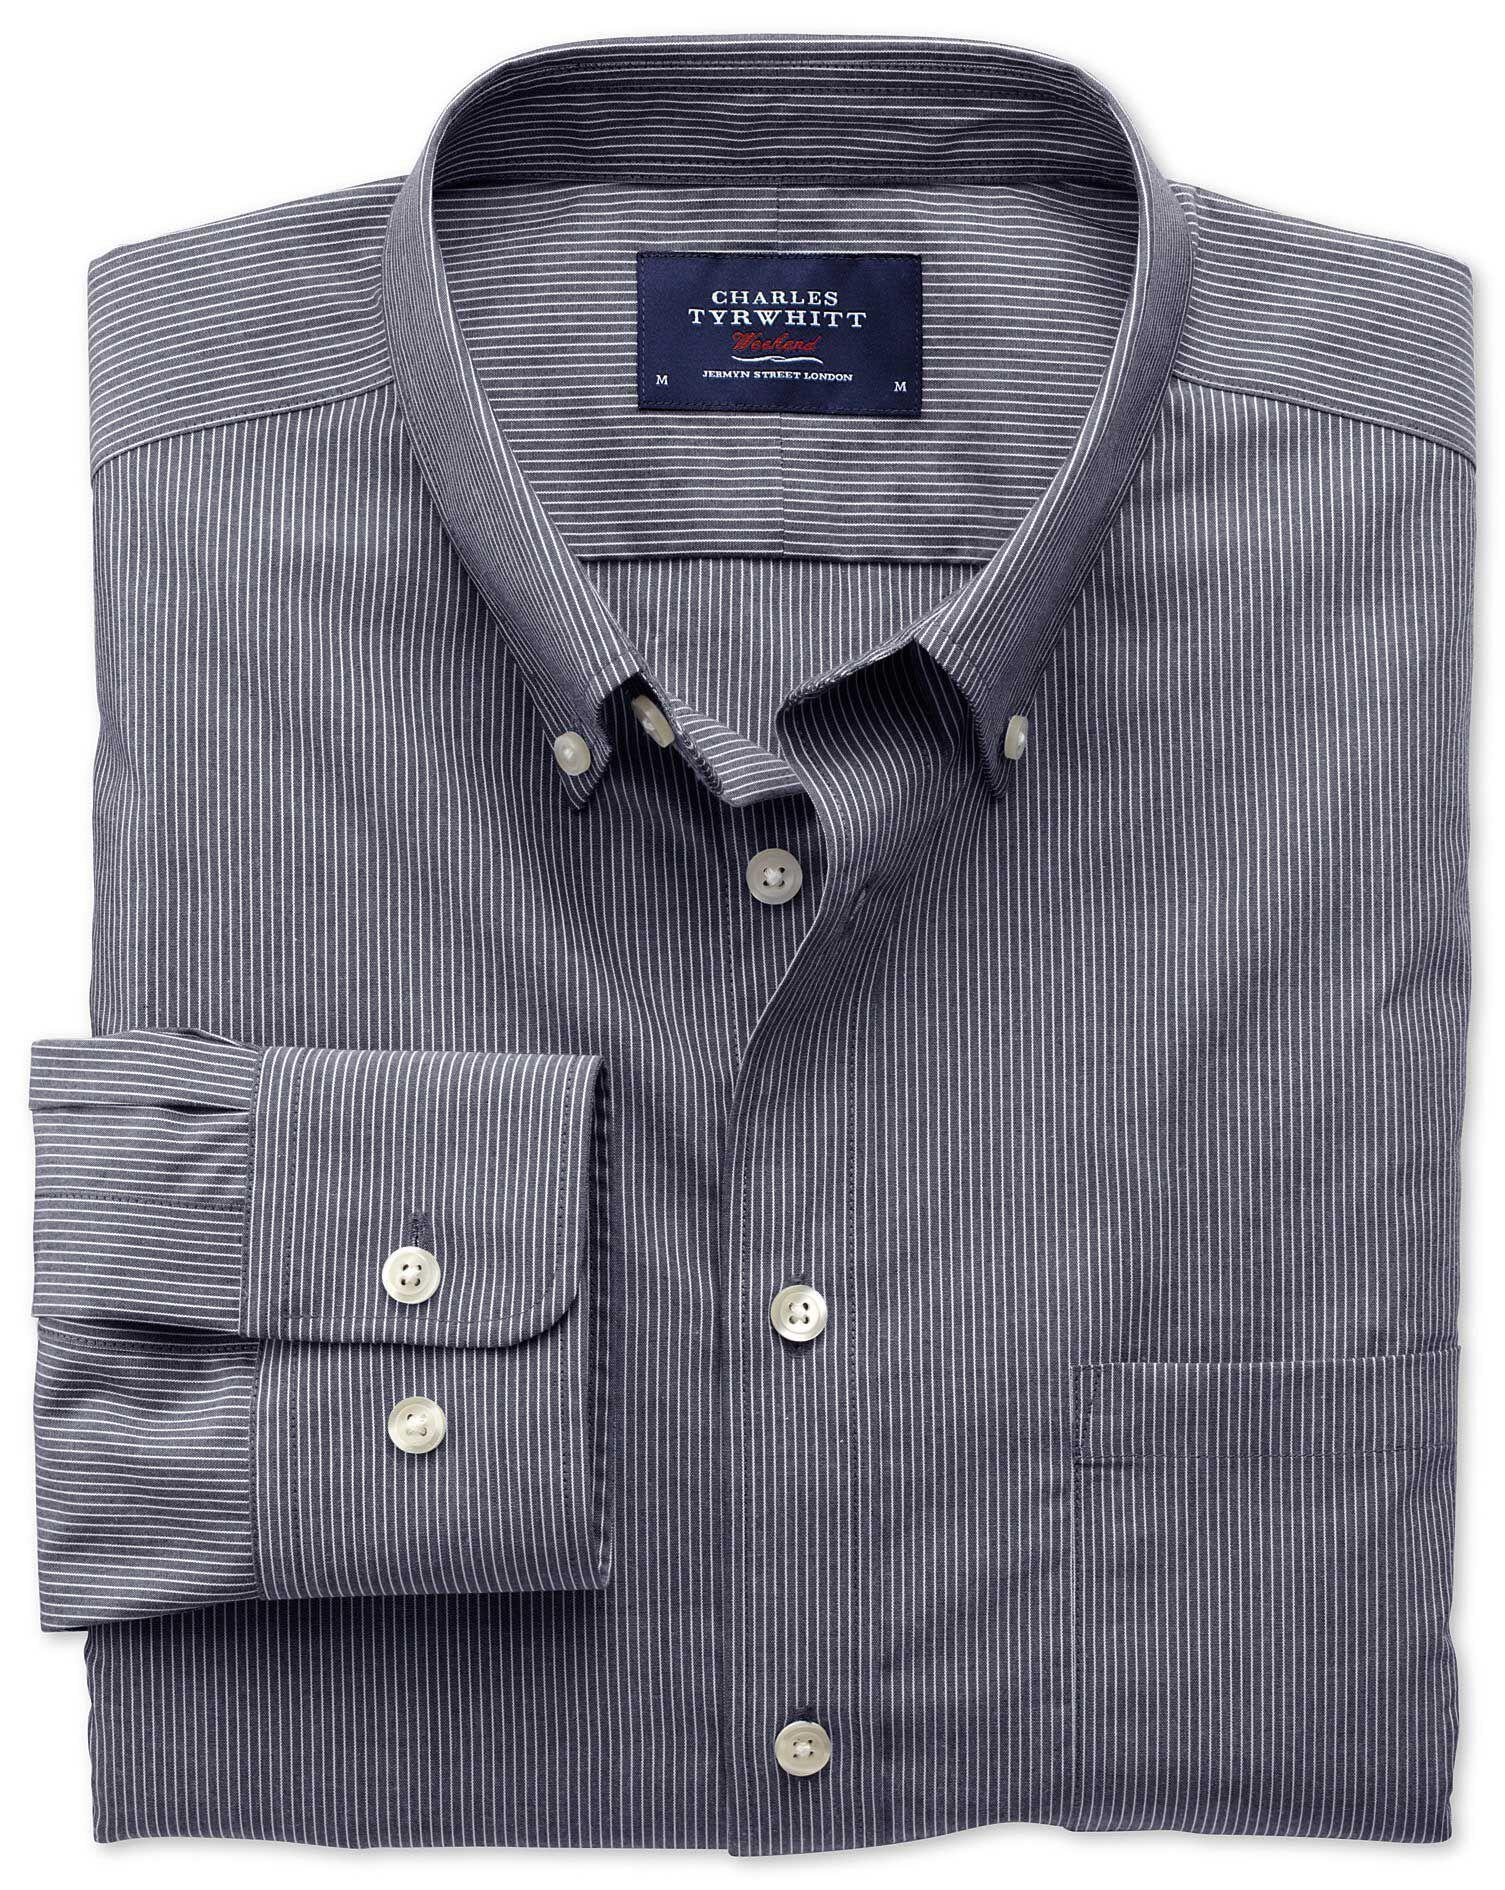 Slim Fit Non-Iron Poplin Indigo Stripe Cotton Shirt Single Cuff Size XS by Charles Tyrwhitt